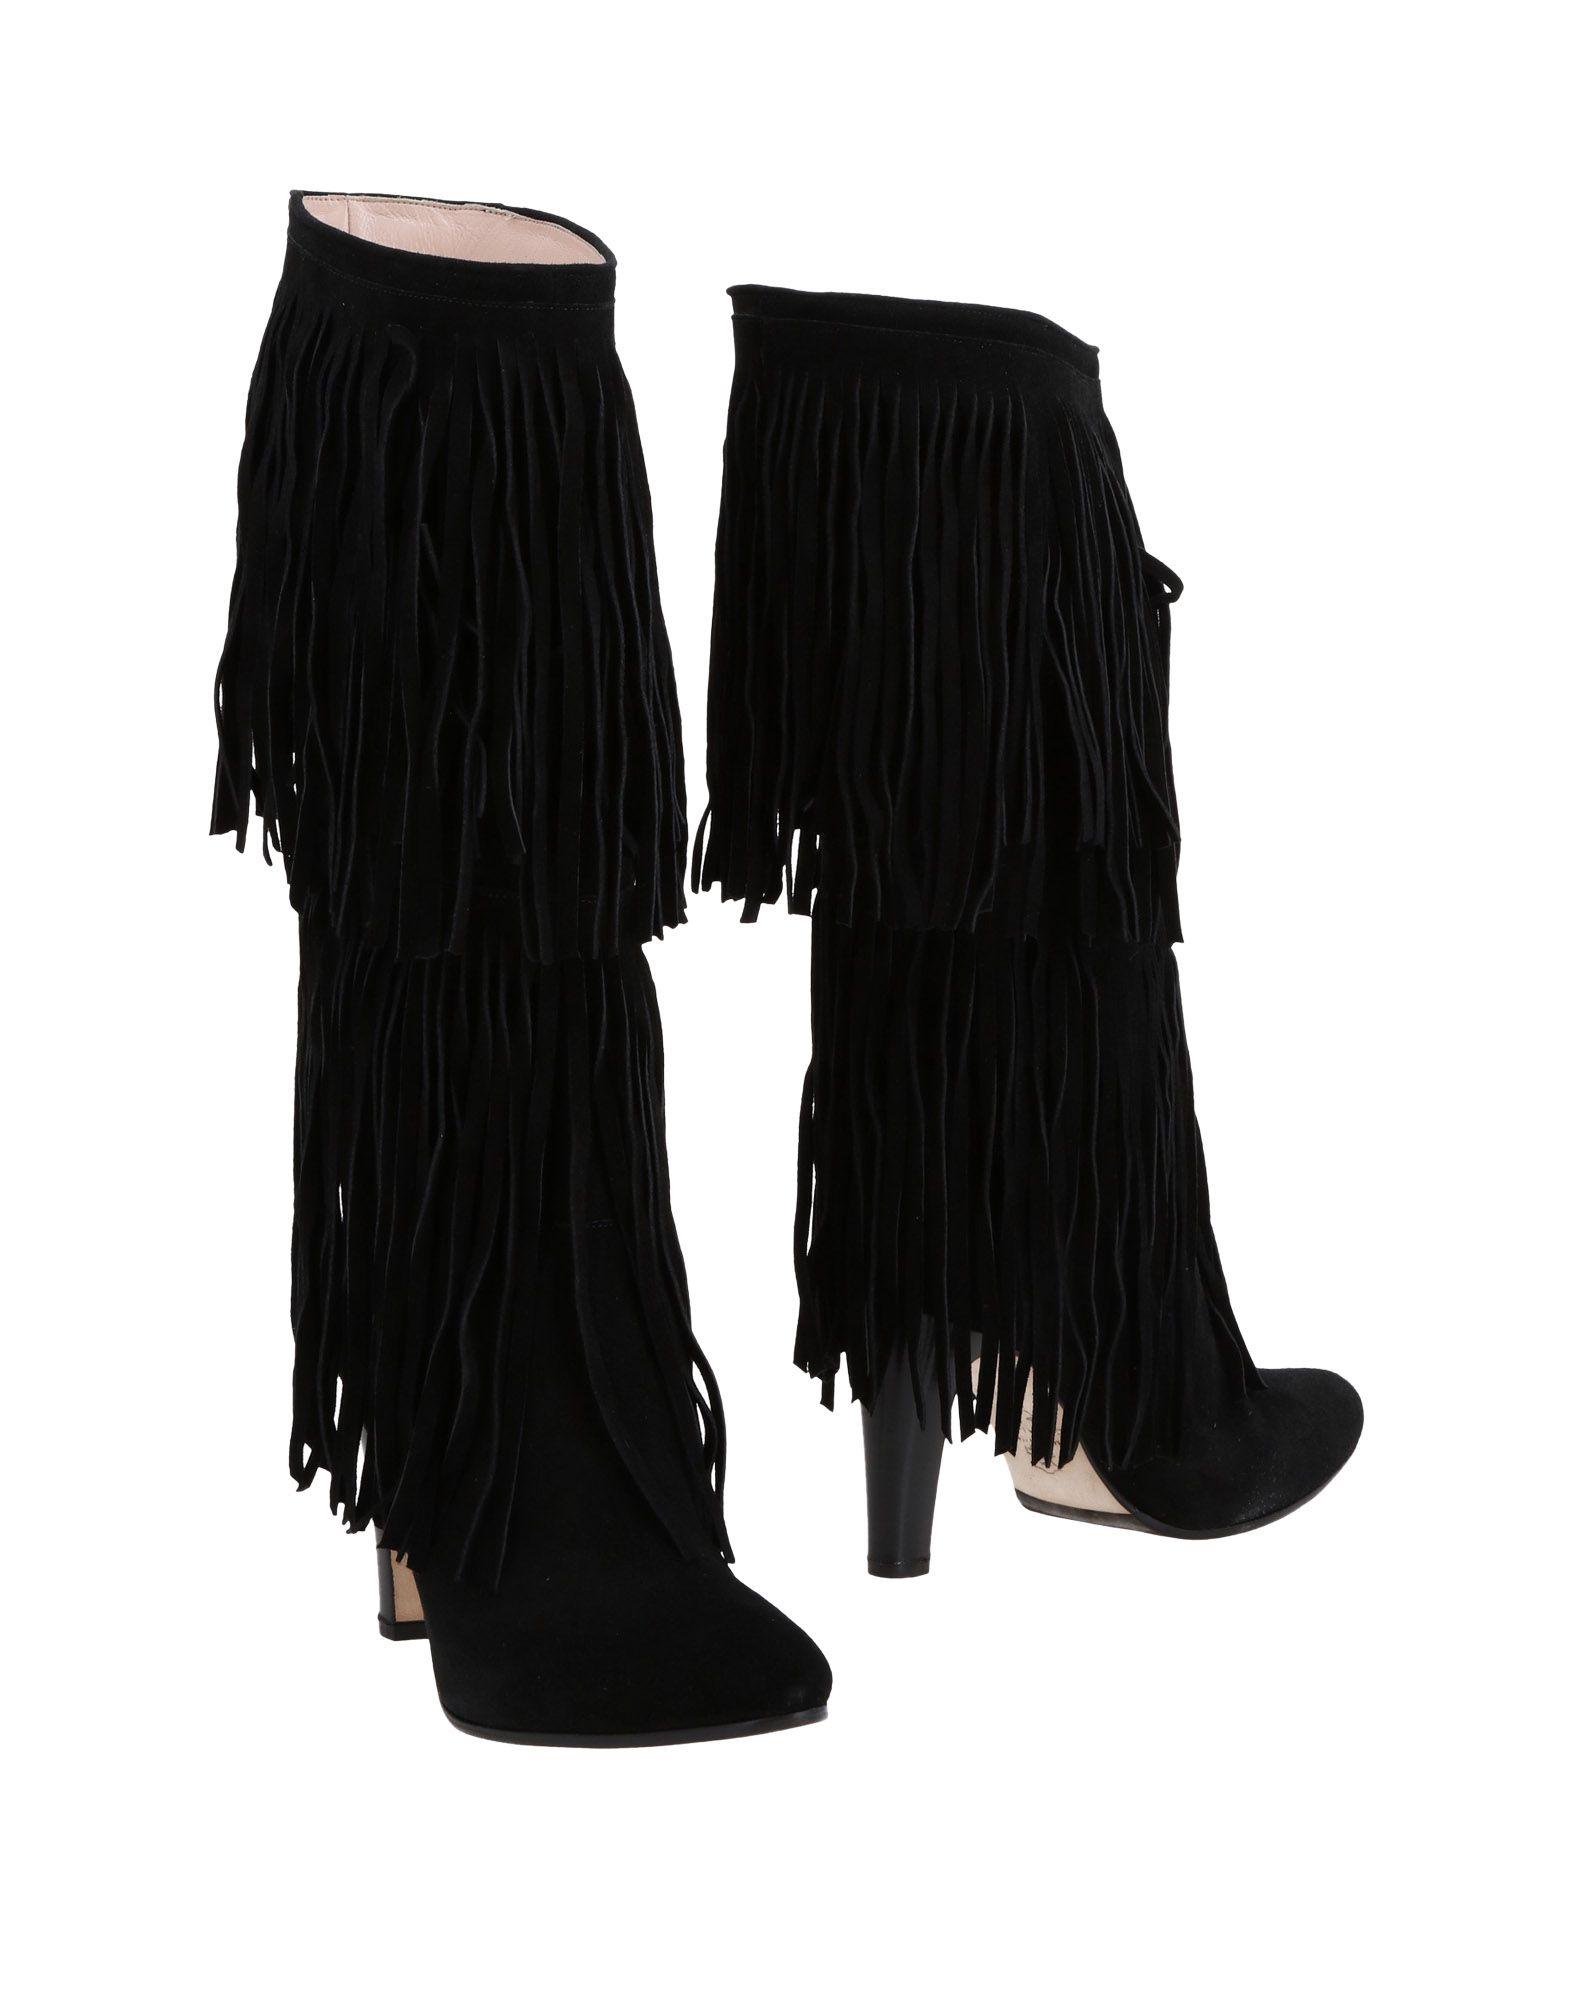 Rabatt Schuhe Cavallini Stiefel Damen  11483172UV